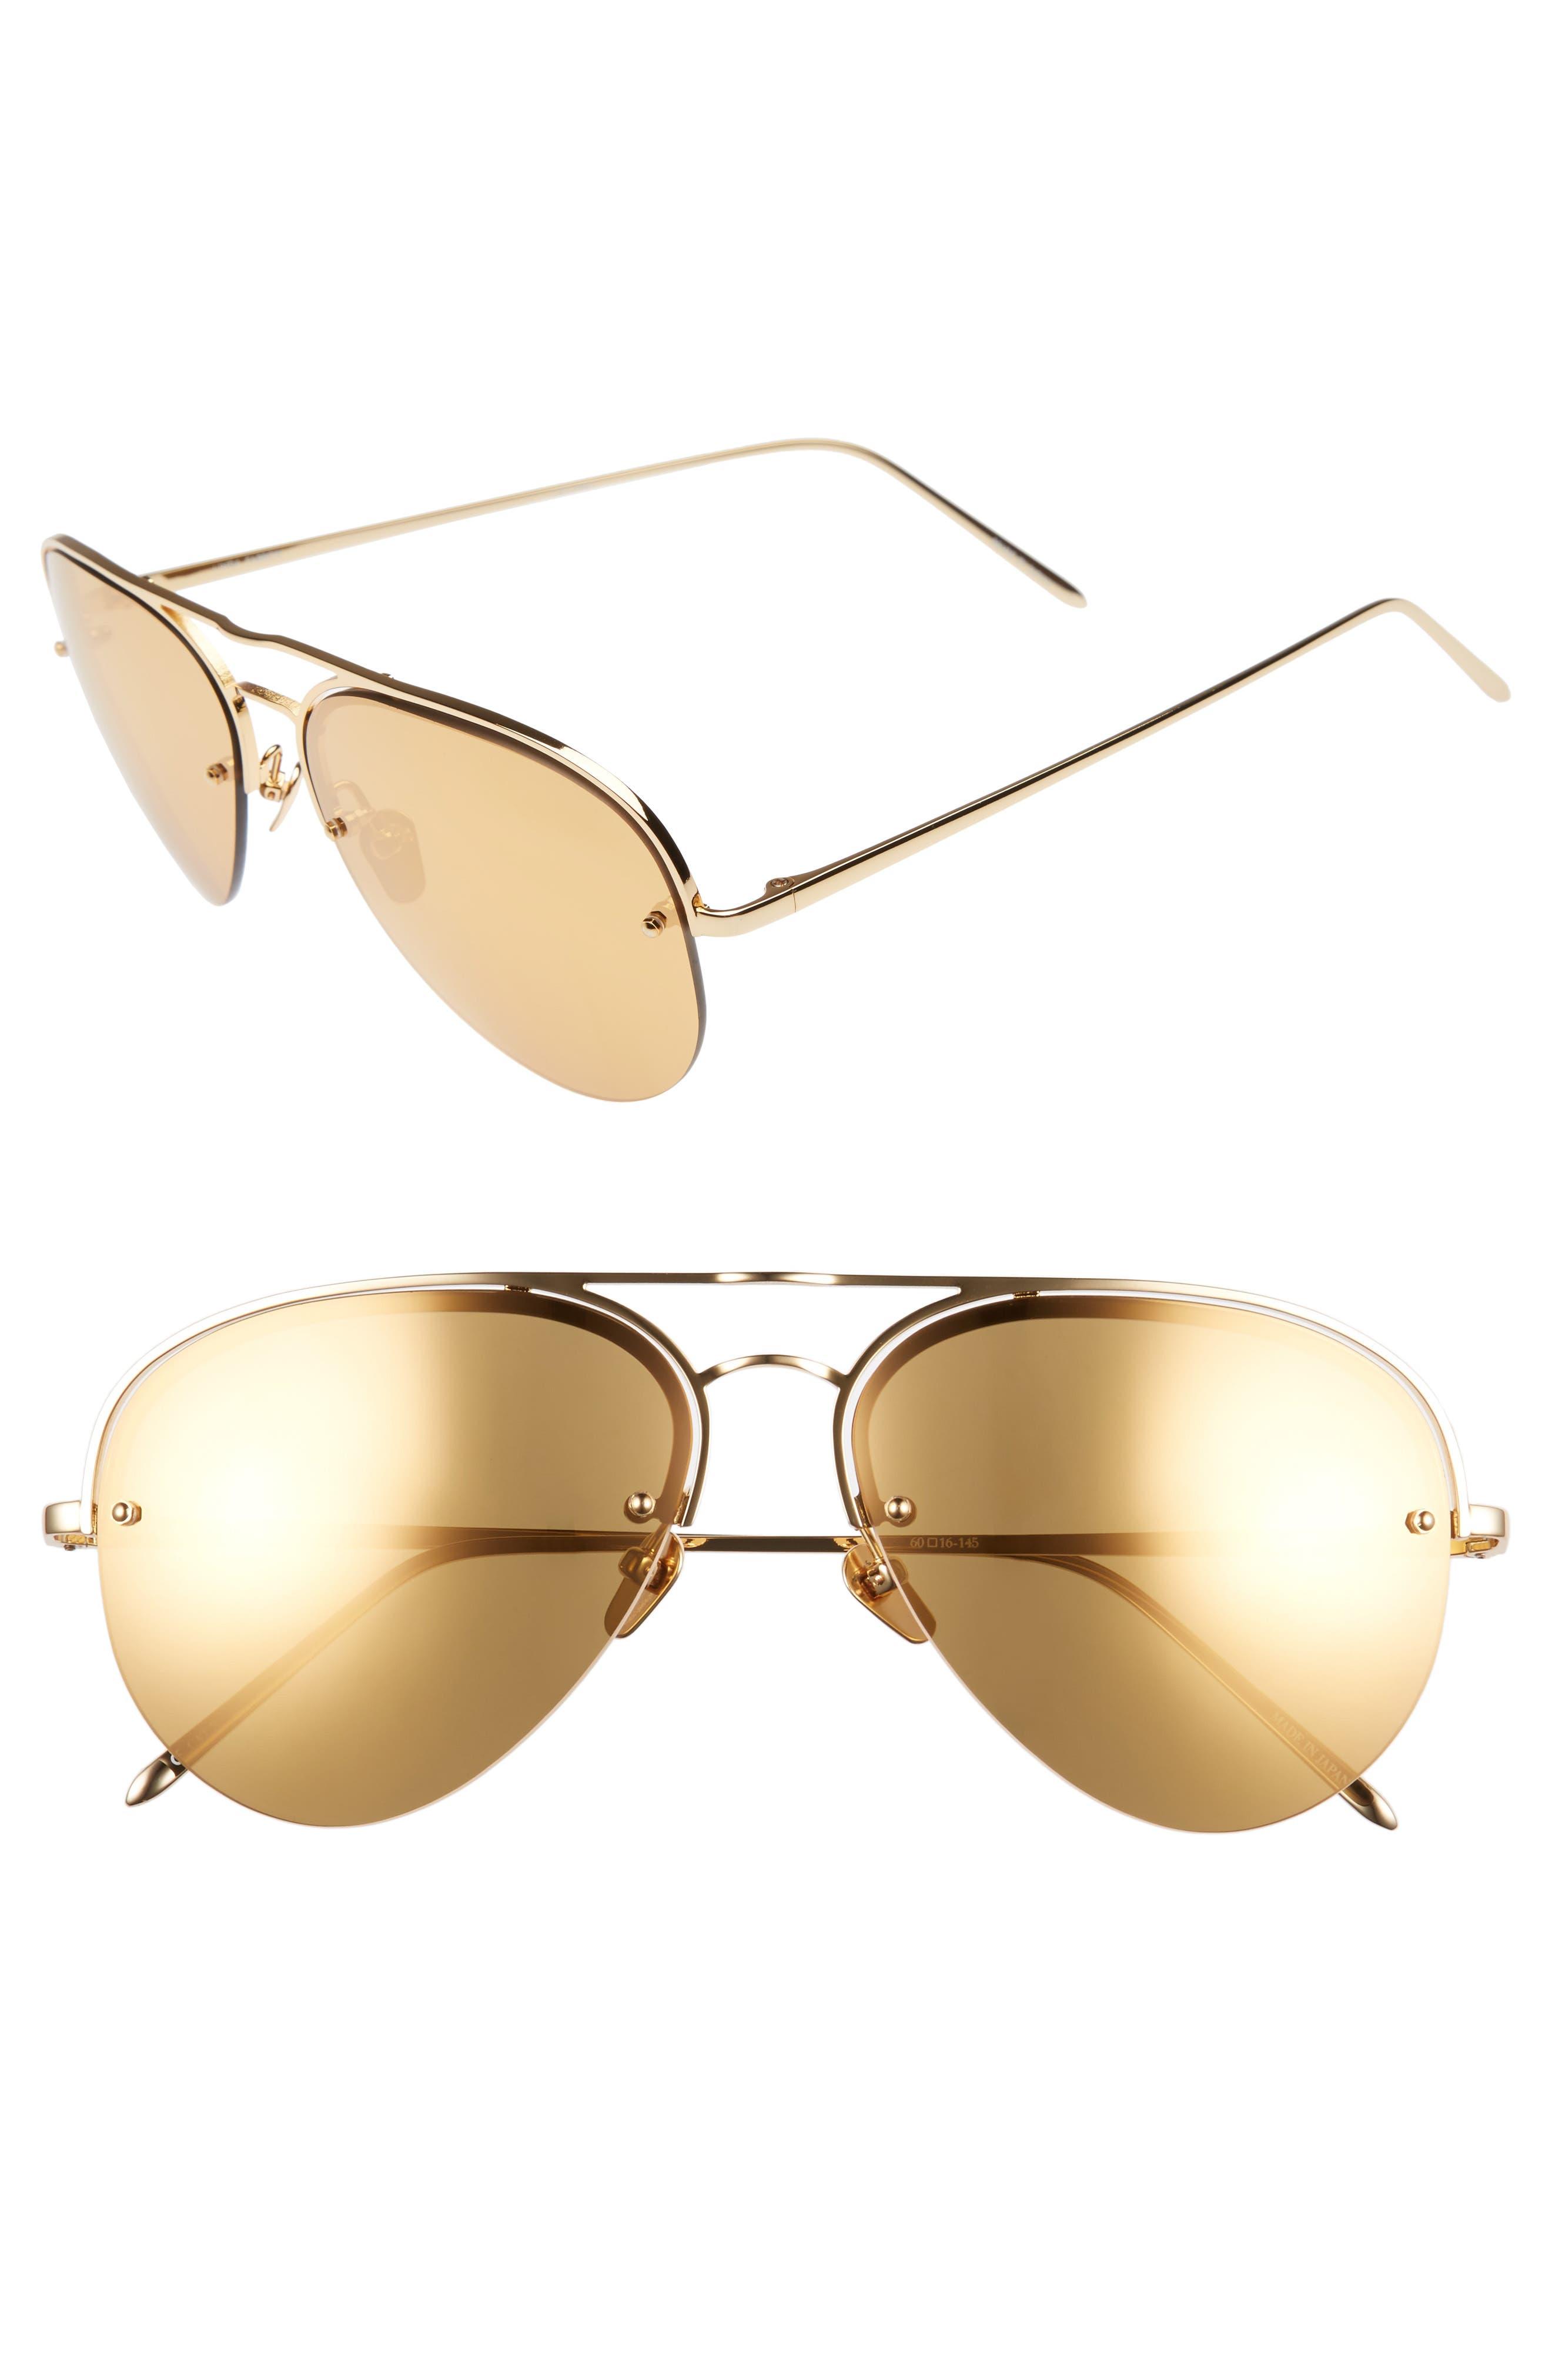 60mm Mirrored 22 Karat Gold Aviator Sunglasses,                         Main,                         color, Yellow Gold/ Gold